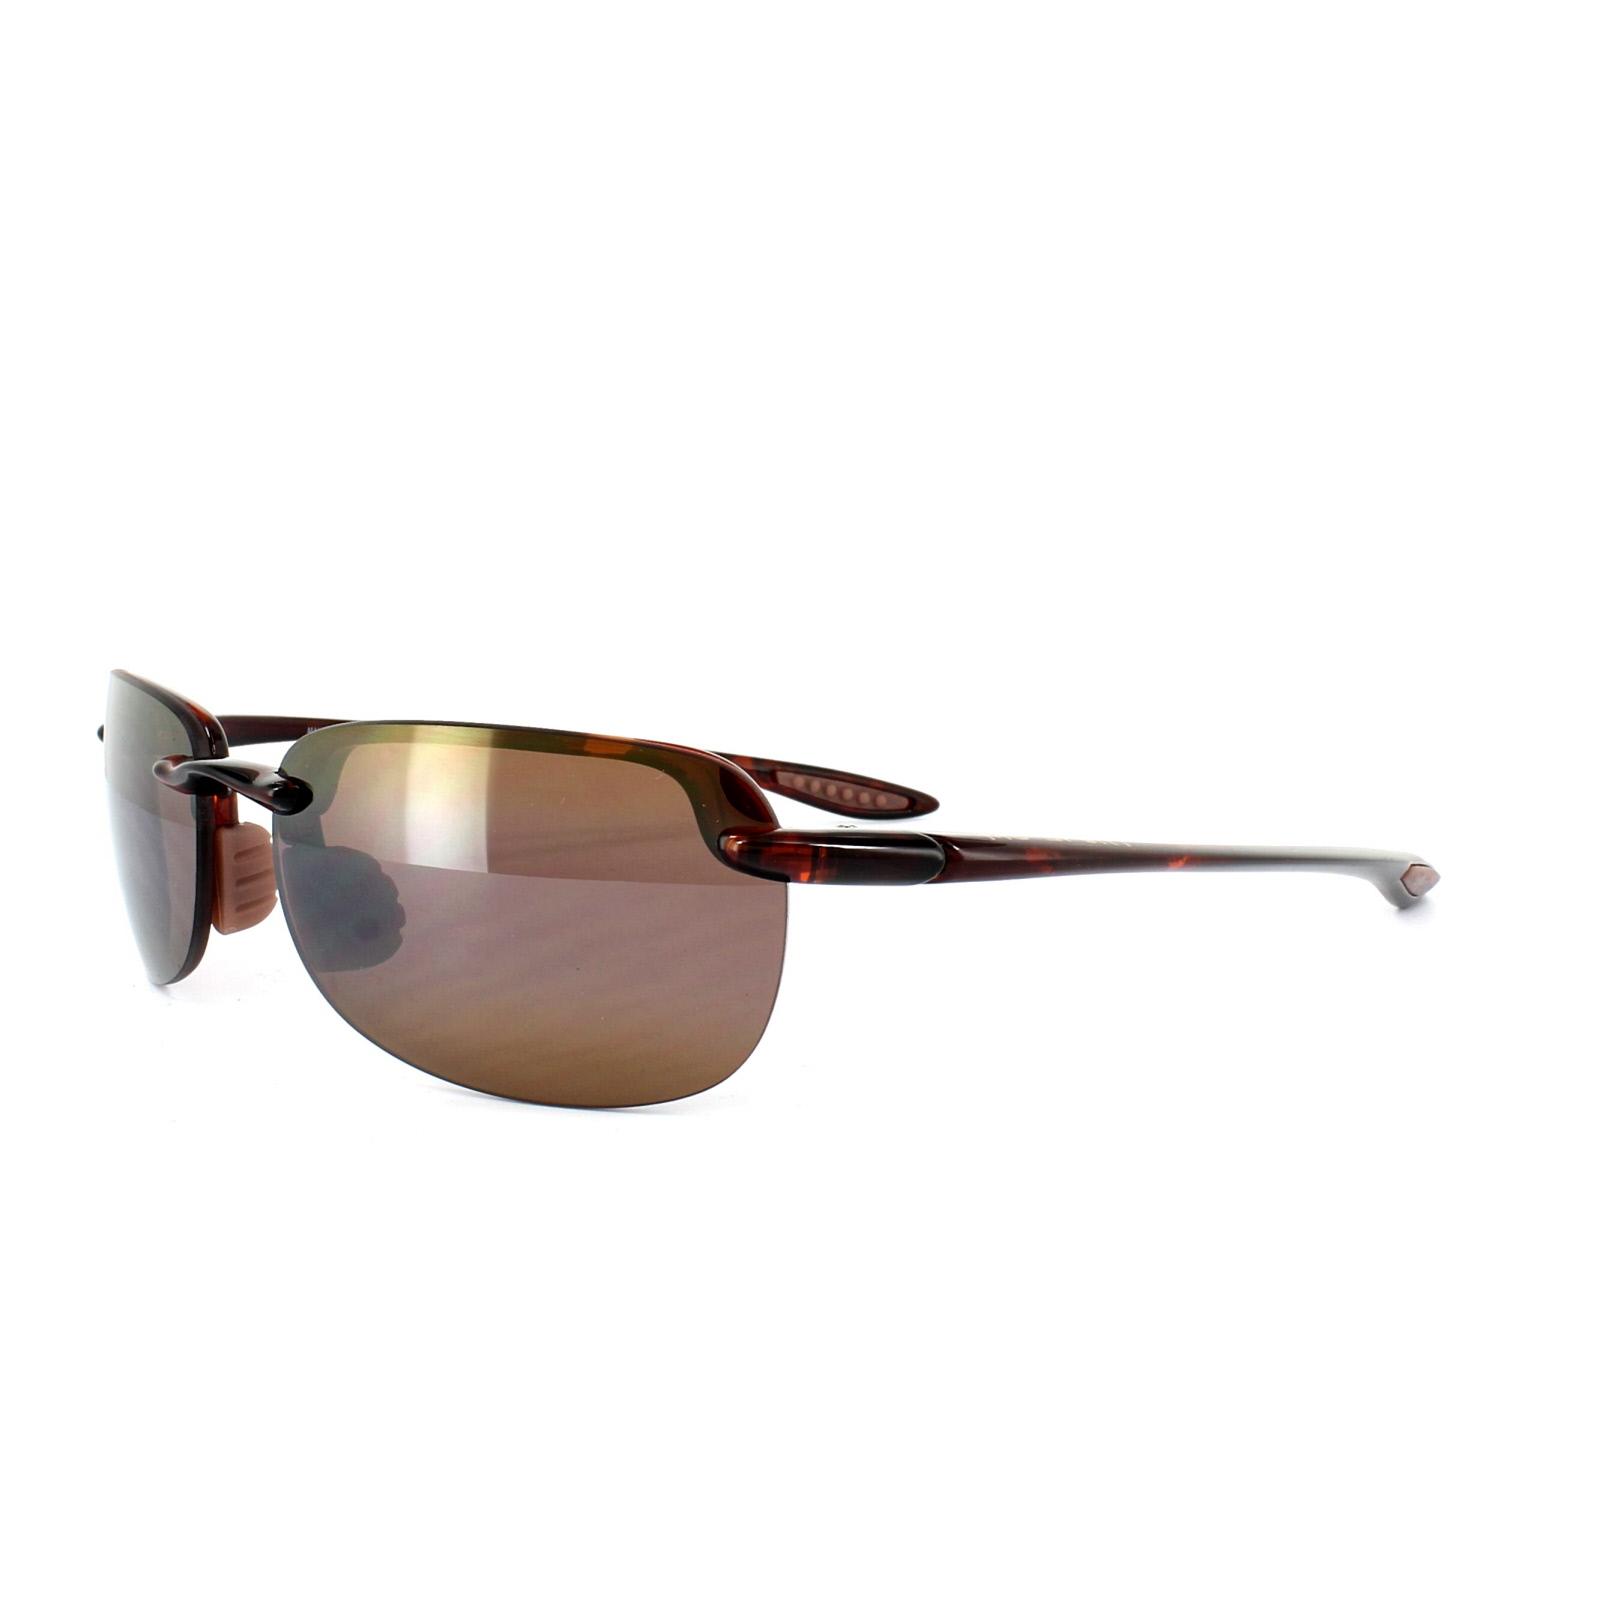 40b47b87412fc Cheap Maui Jim Sandy Beach Sunglasses - Discounted Sunglasses